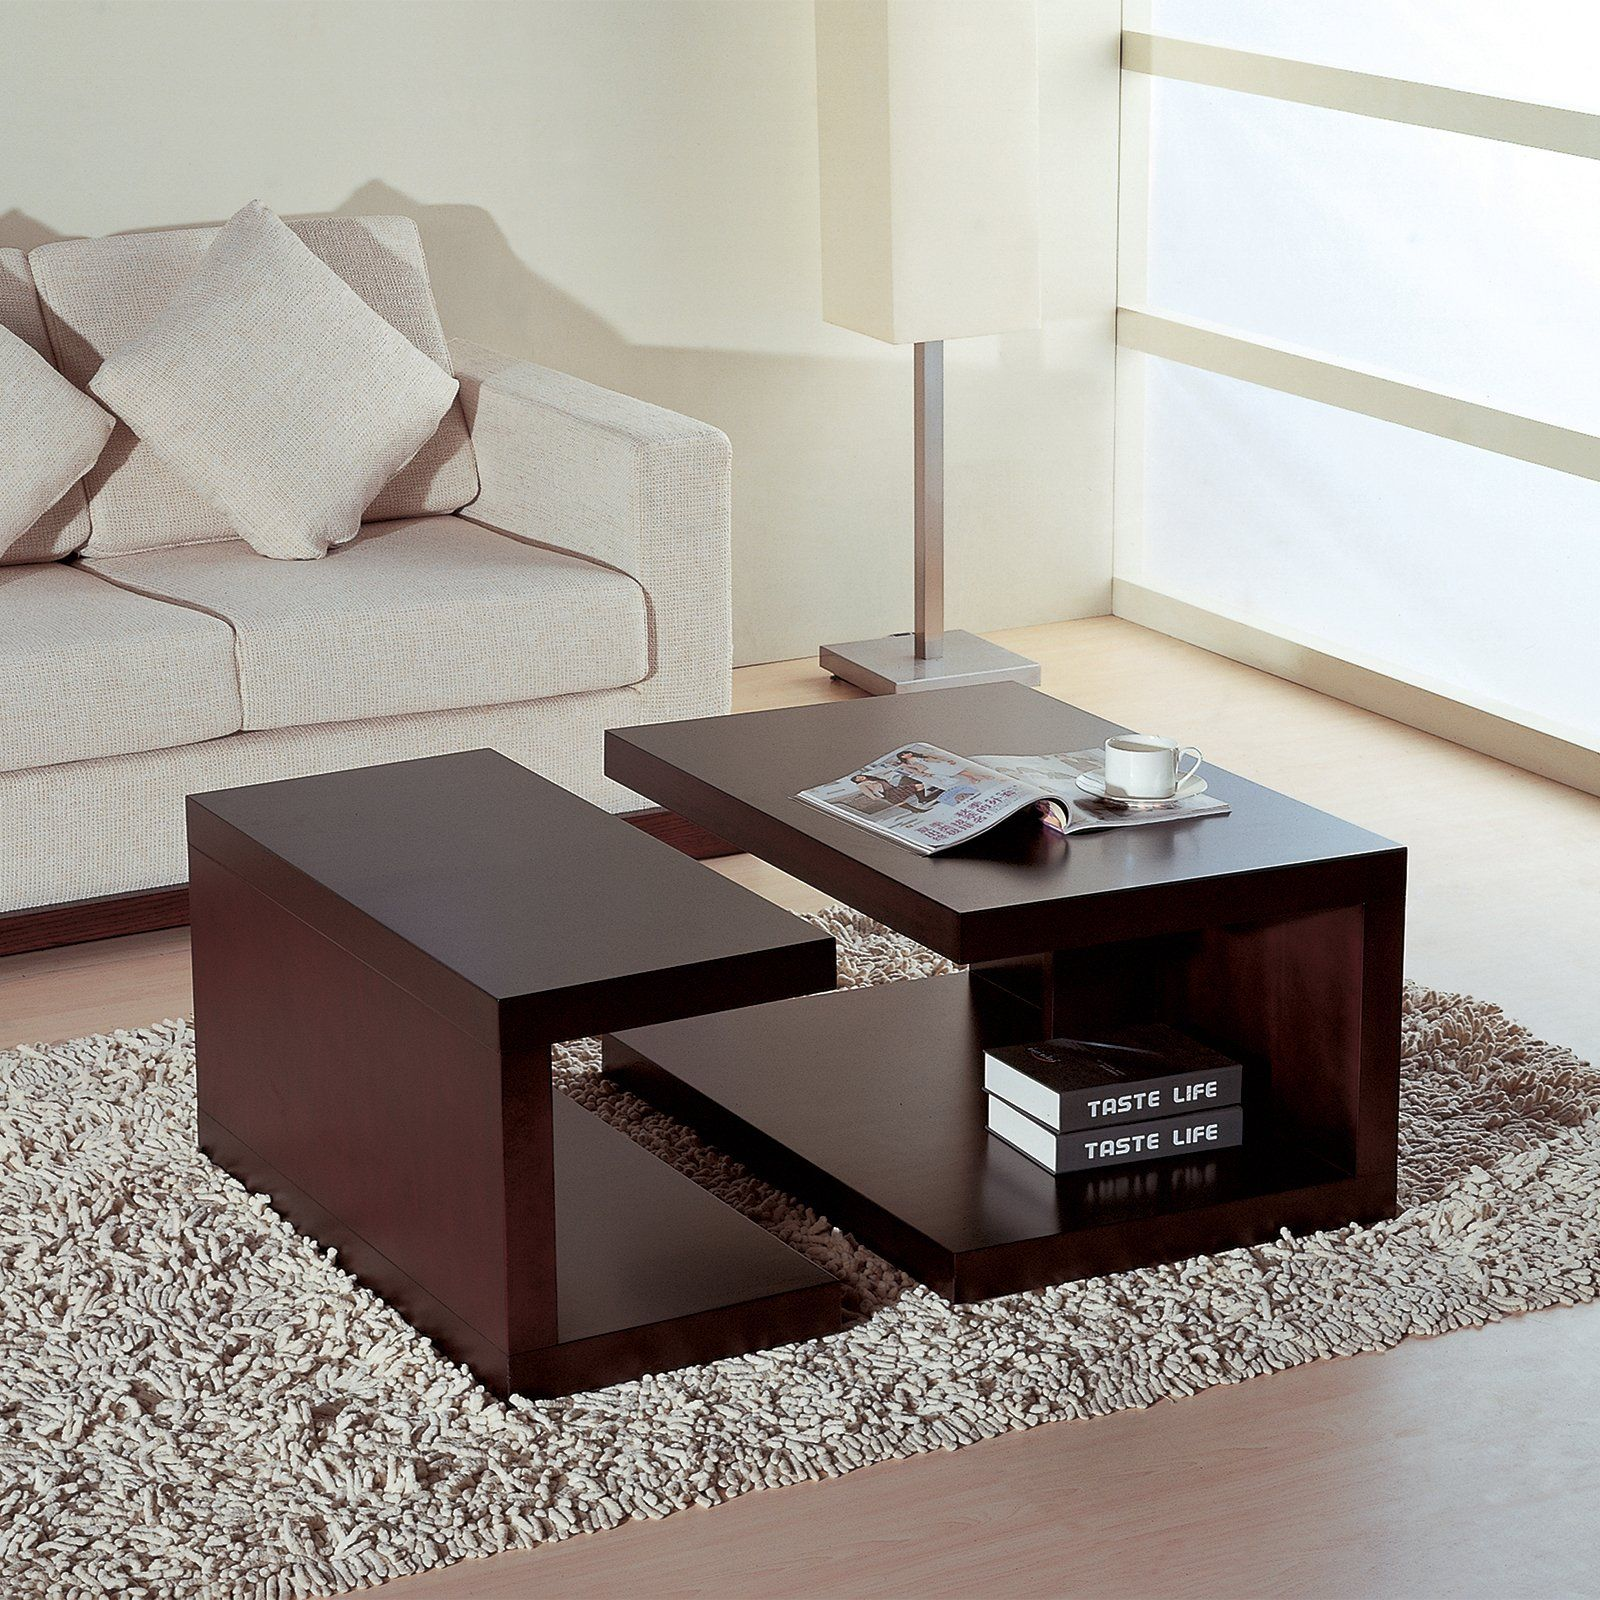 Jengo 2 Piece Coffee Table Espresso Www Hayneedle Com Coffee Table Round Coffee Table Living Room Center Table Living Room [ 1600 x 1600 Pixel ]